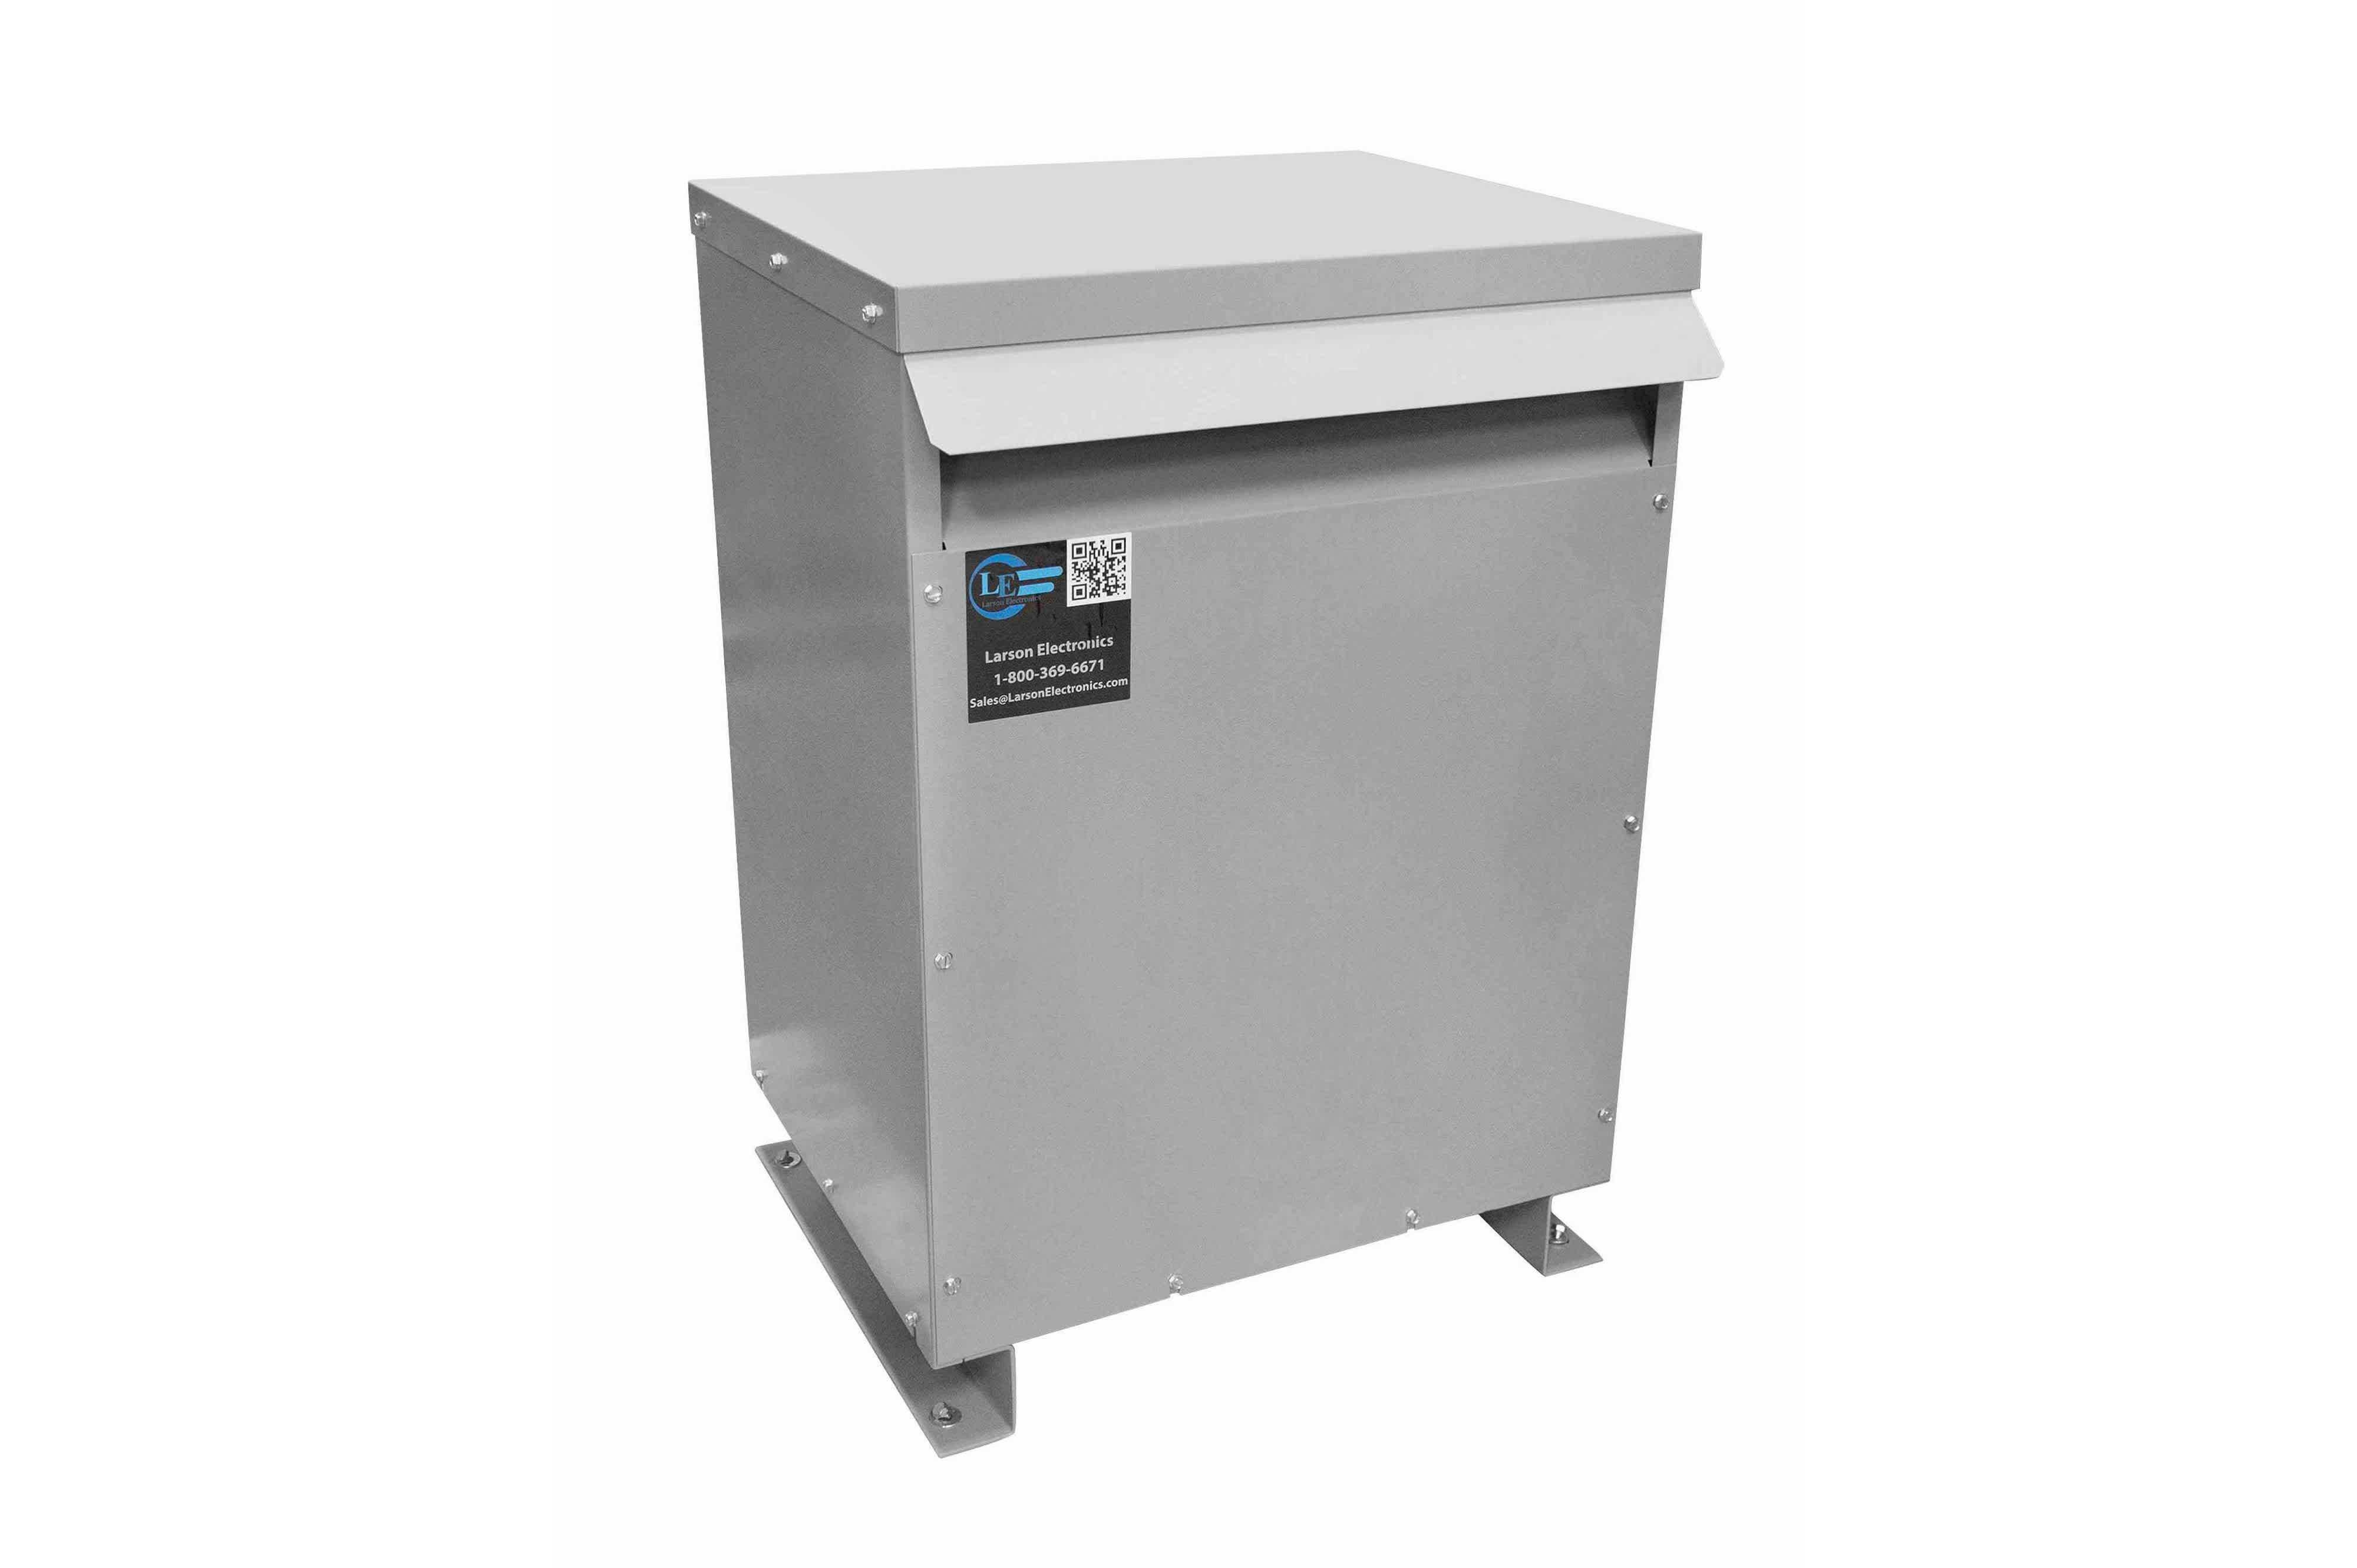 167 kVA 3PH Isolation Transformer, 440V Wye Primary, 208V Delta Secondary, N3R, Ventilated, 60 Hz